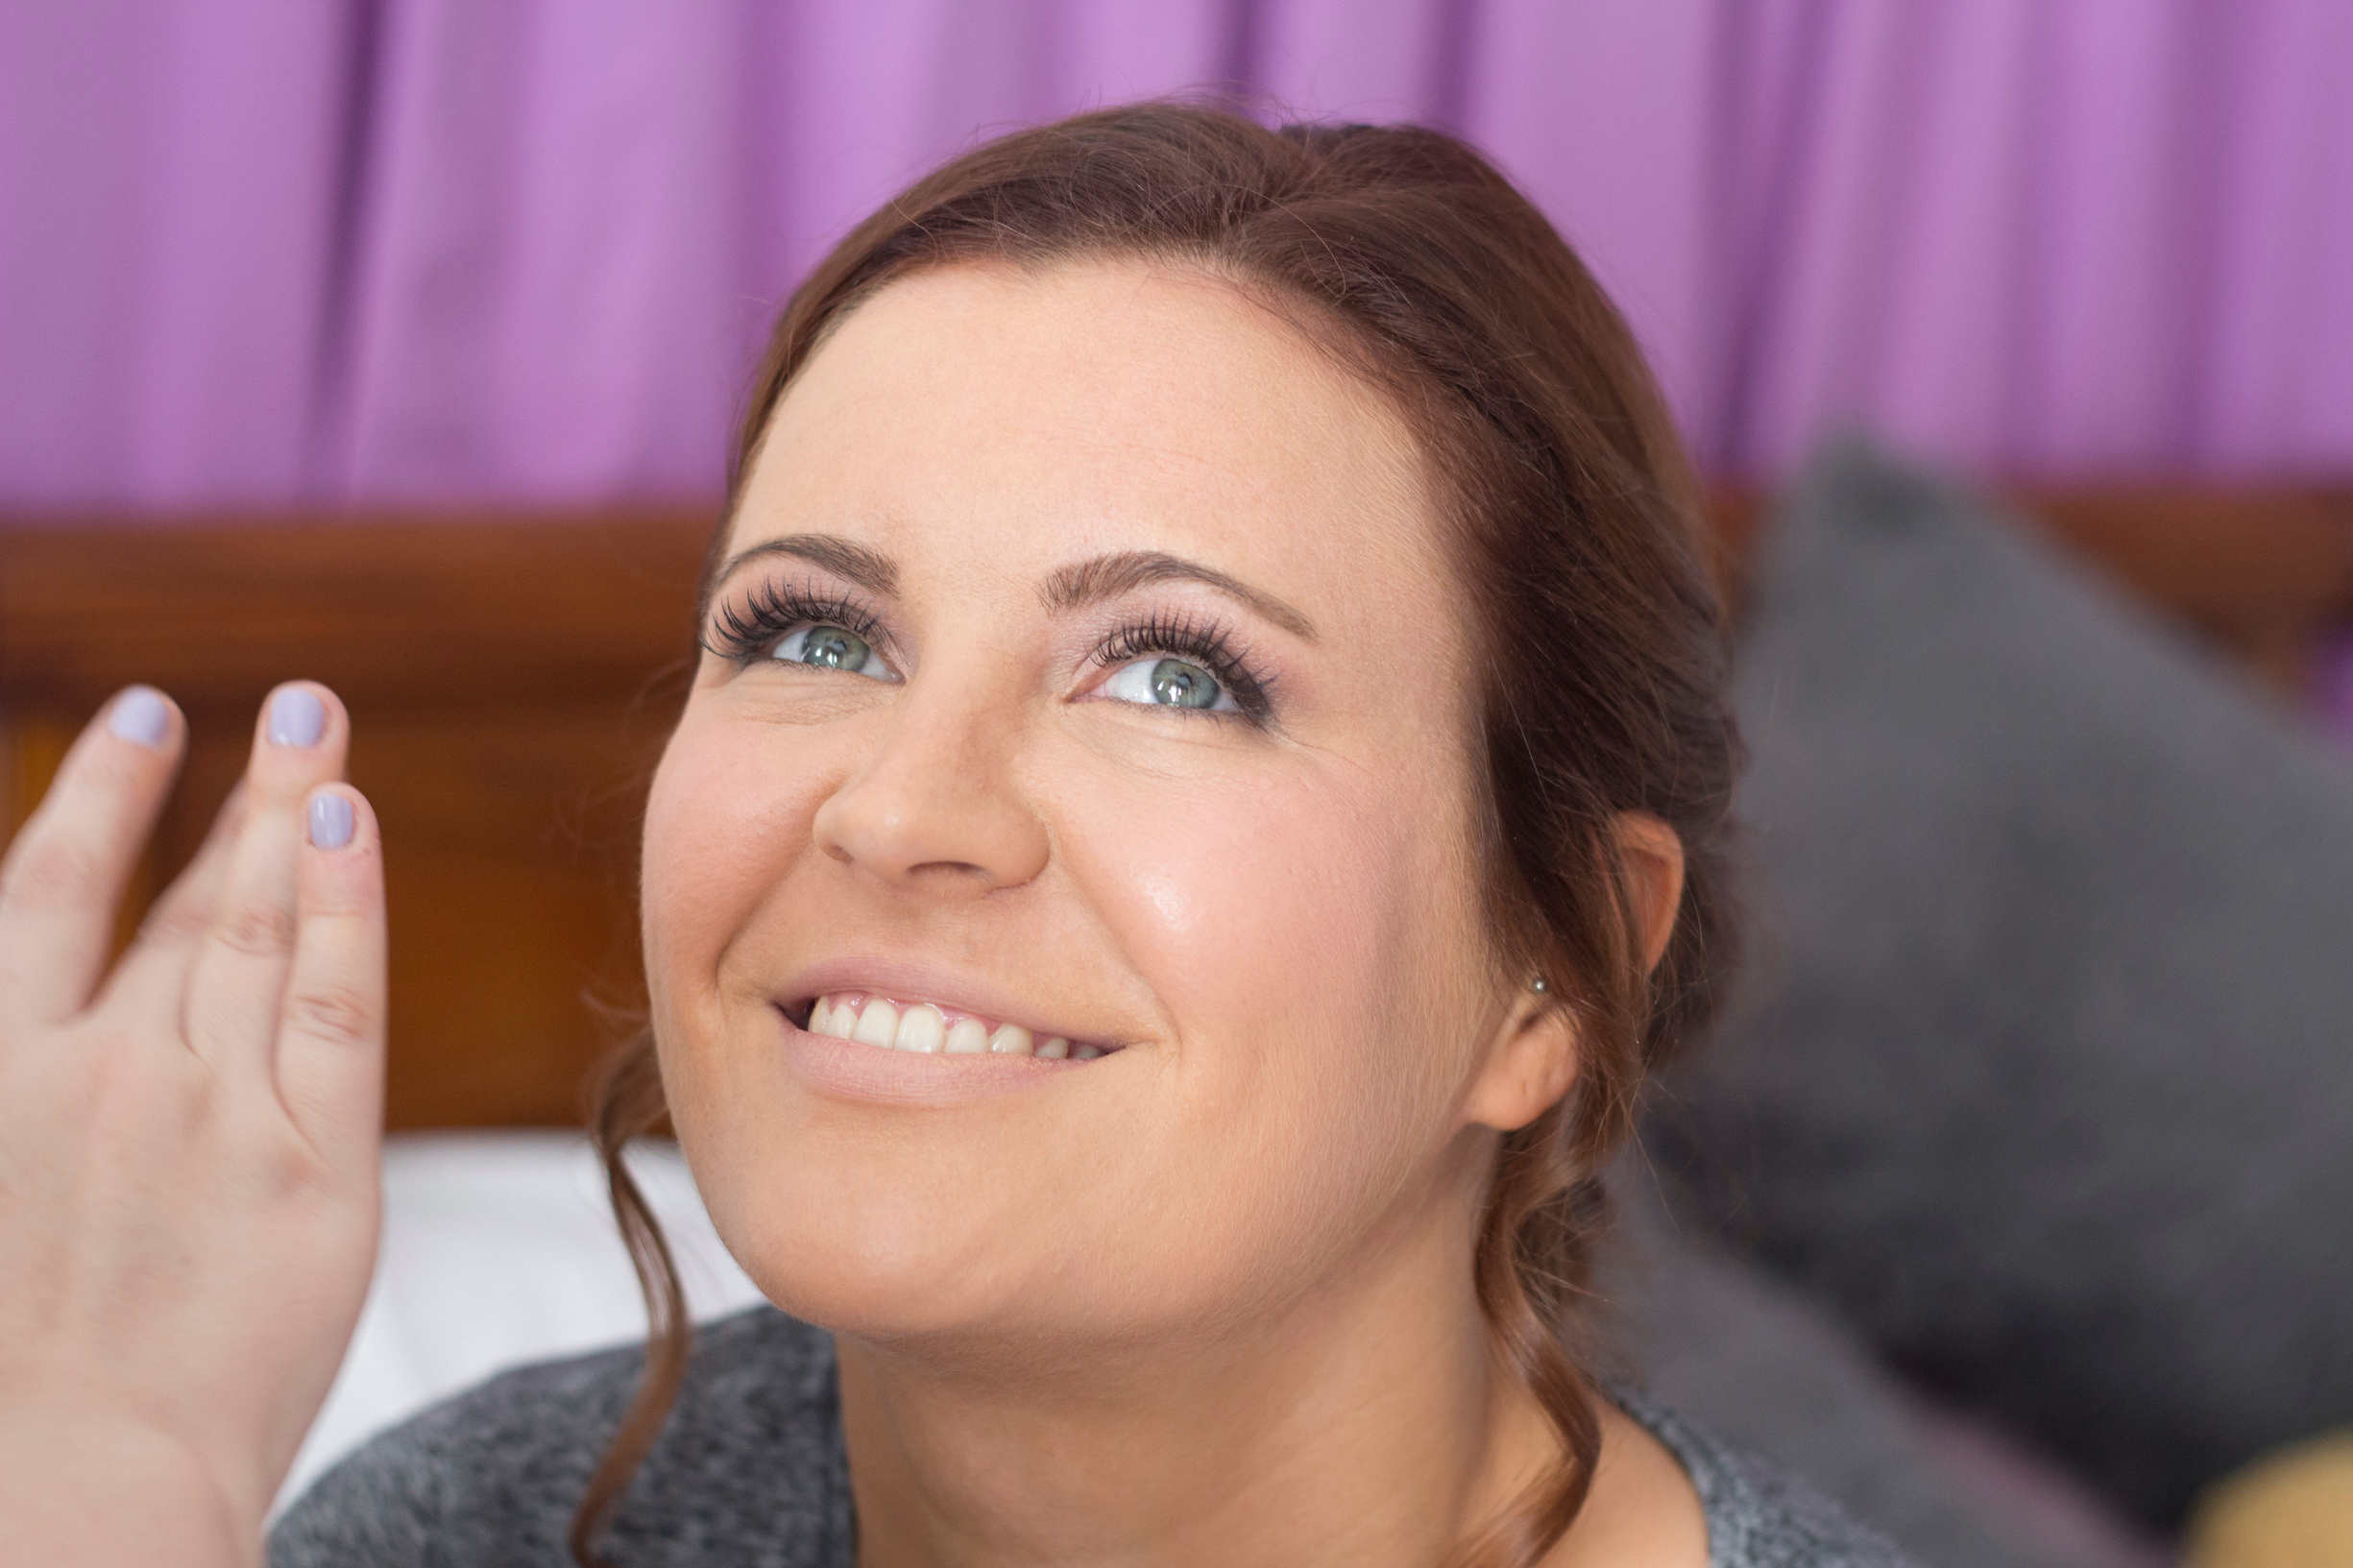 Nicola Louise Makeup